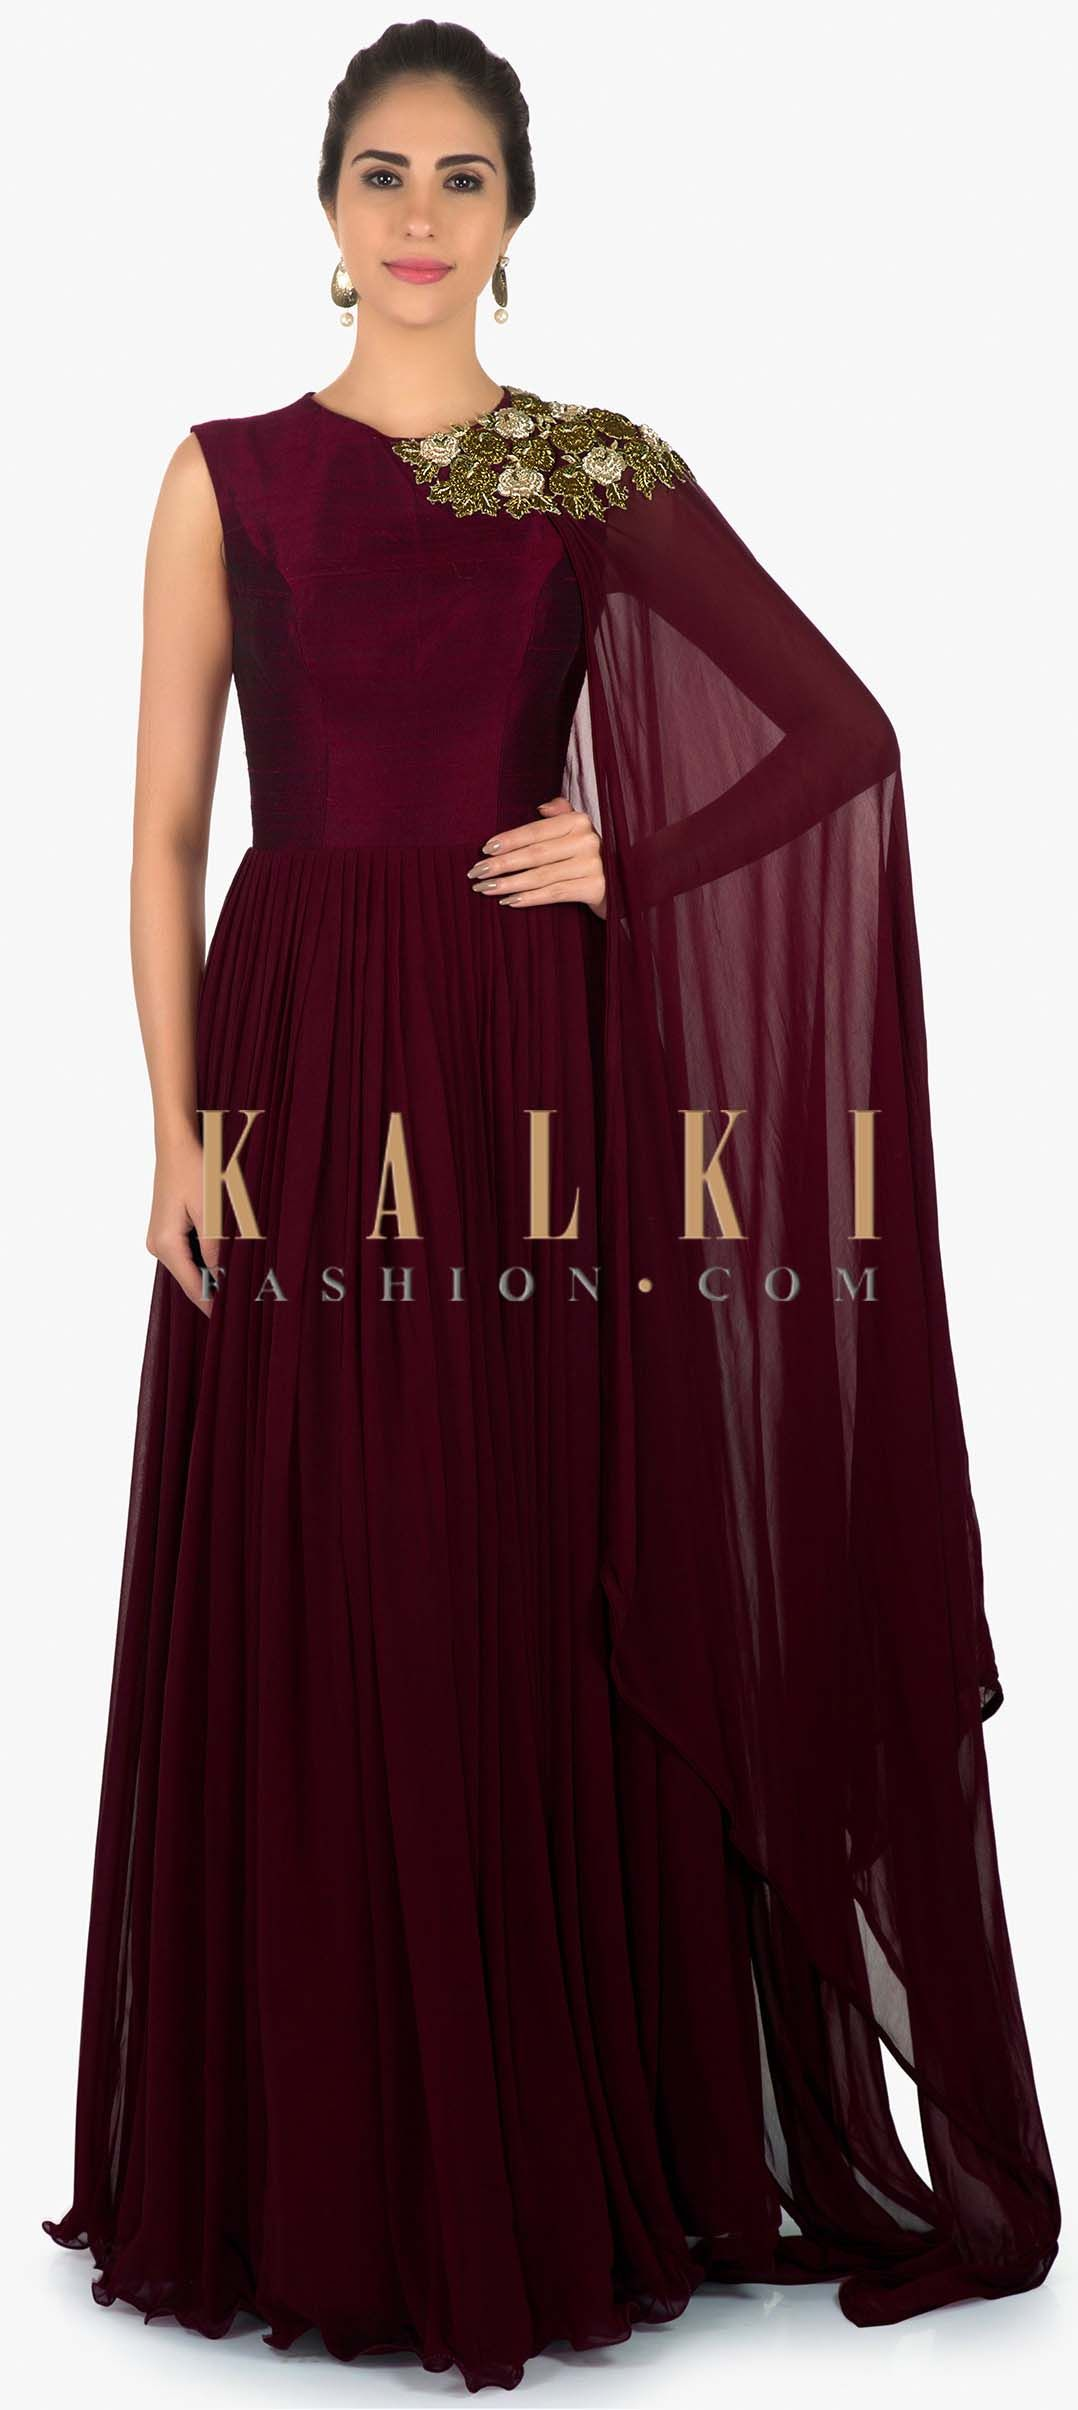 d70643552d7 Wine anarkali suit in zardosi embroidered attach dupatta only on Kalki